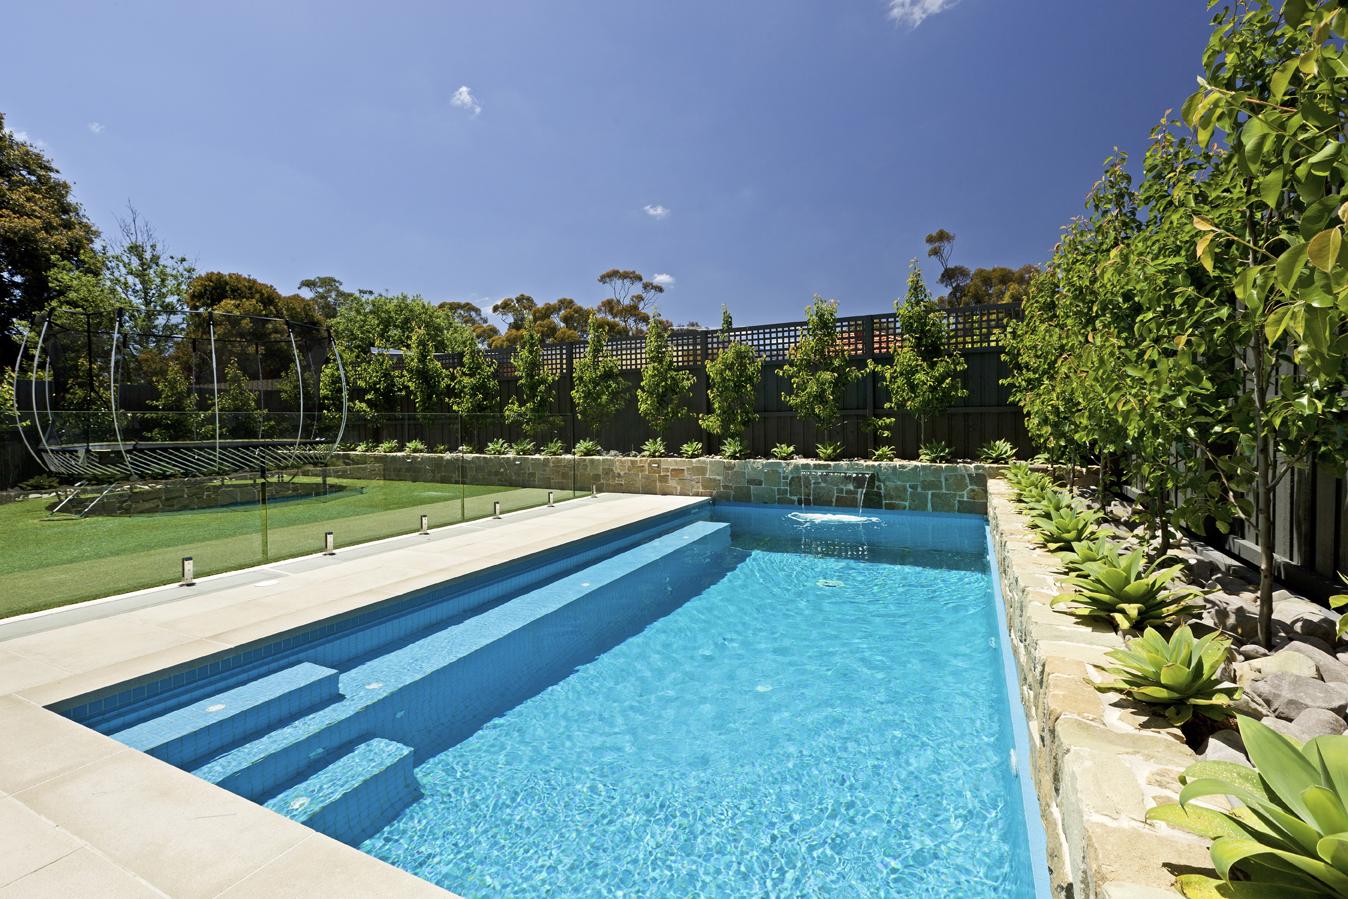 Modern Swimming Pools Design Ideas | Lib Wallpapers